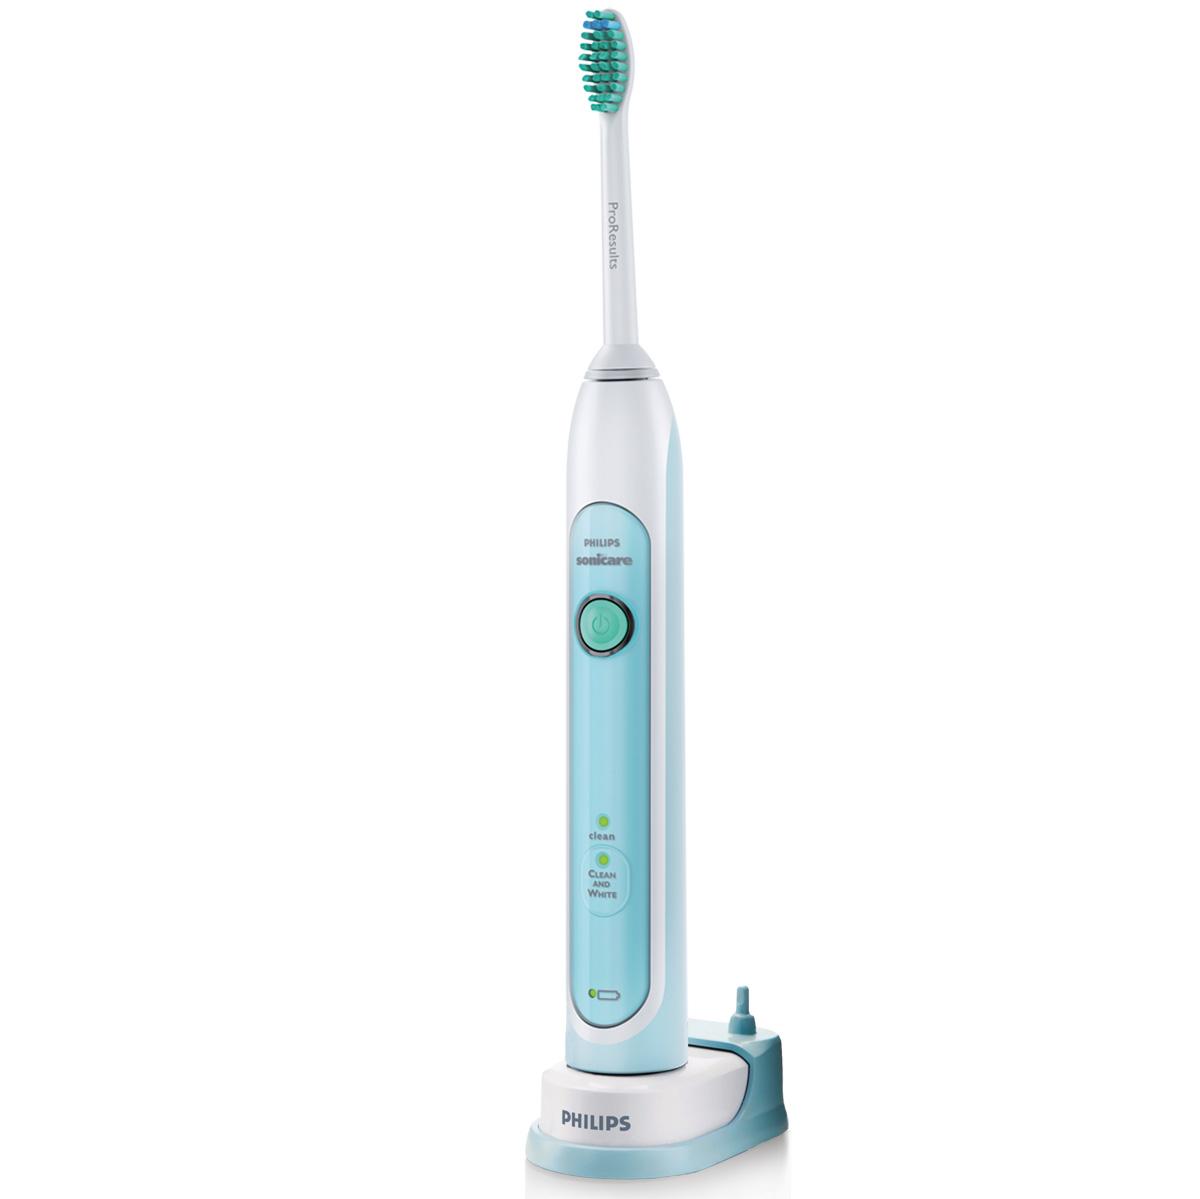 Philips Sonicare HX6711/02 электрическая зубная щетка